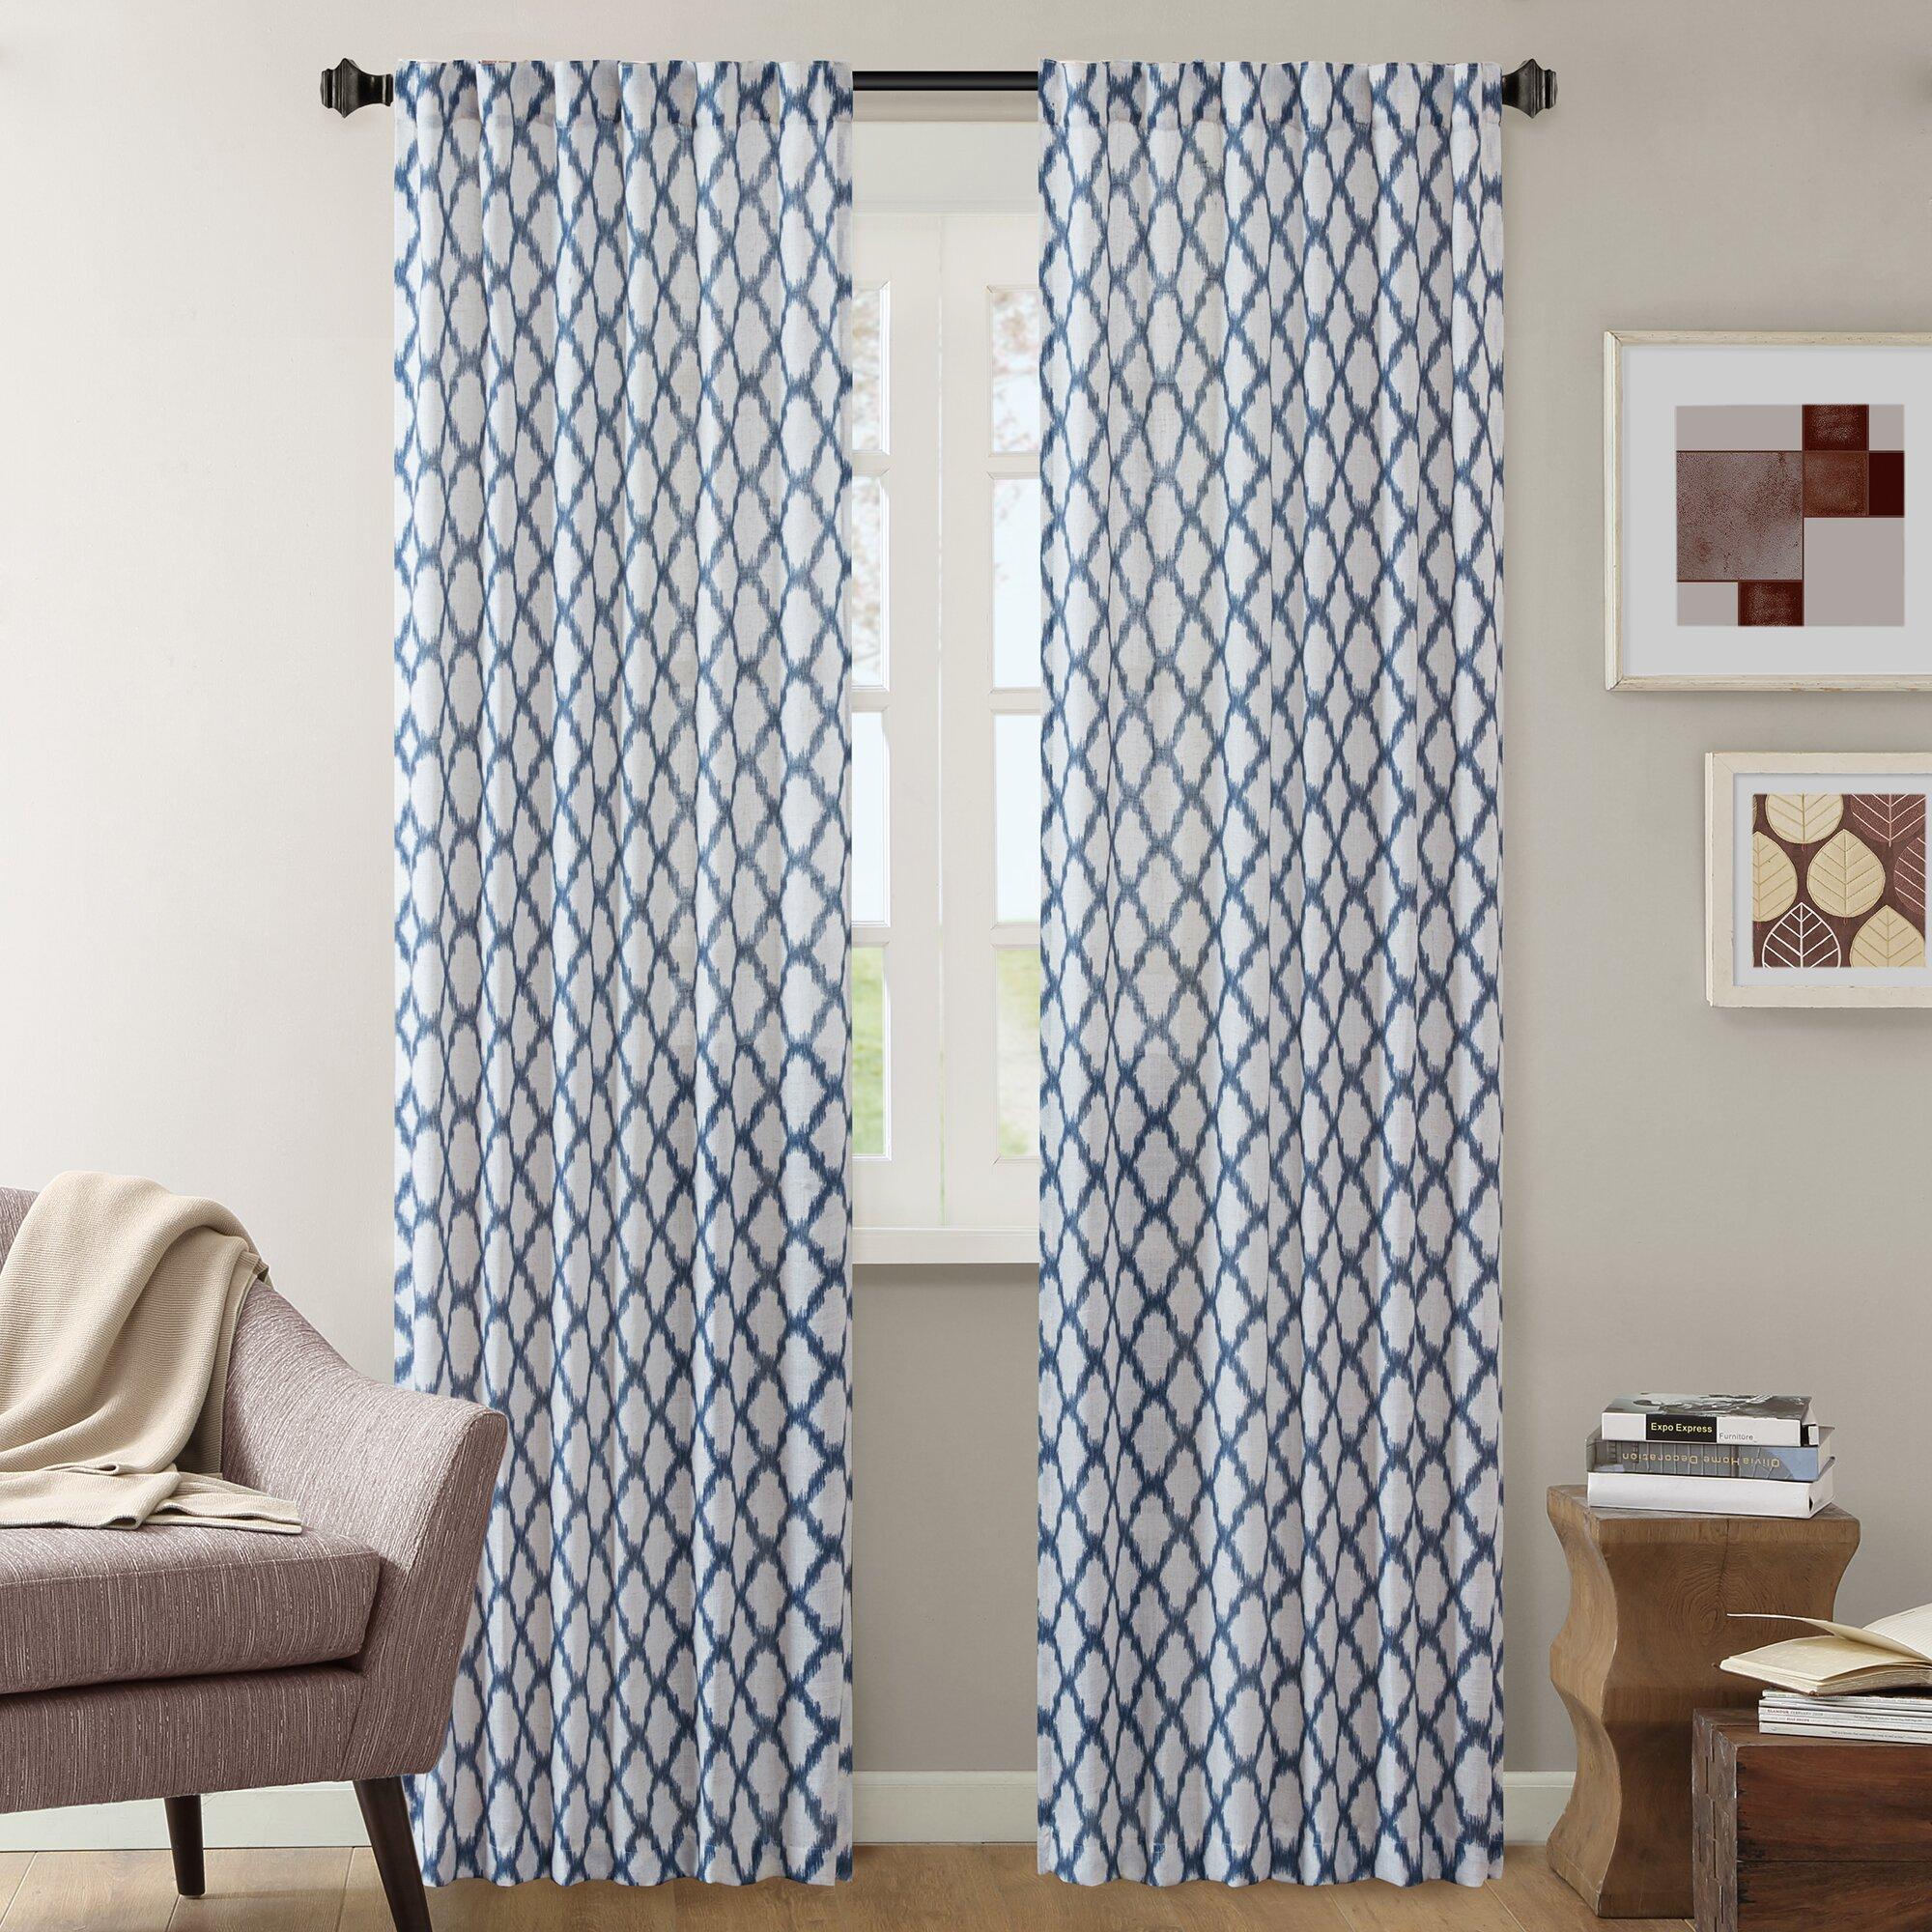 Designer curtain panels - Nakita Single Curtain Panel